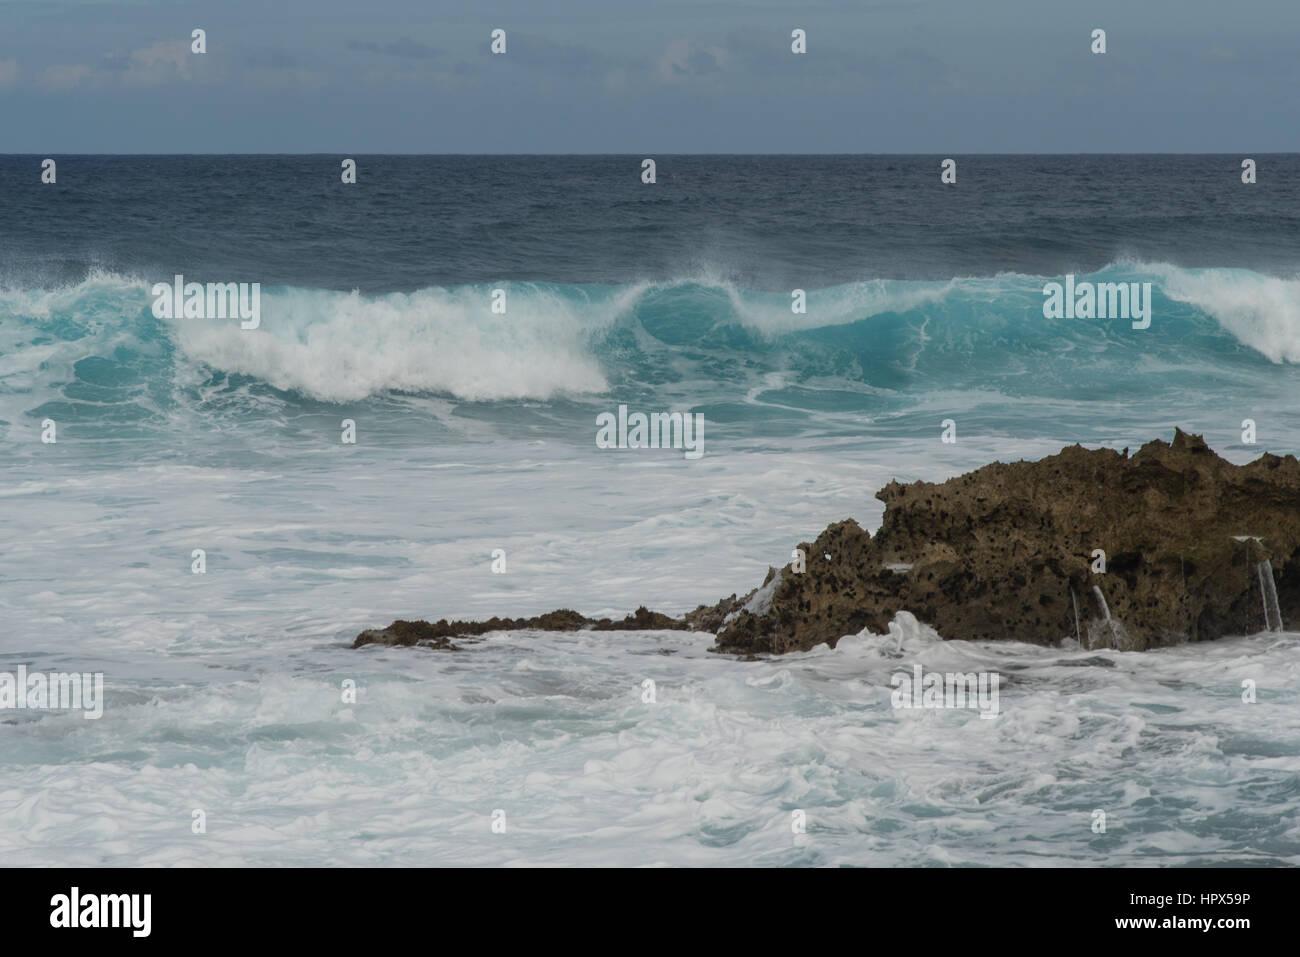 North Shore, Oahu, Hawaii - Stock Image